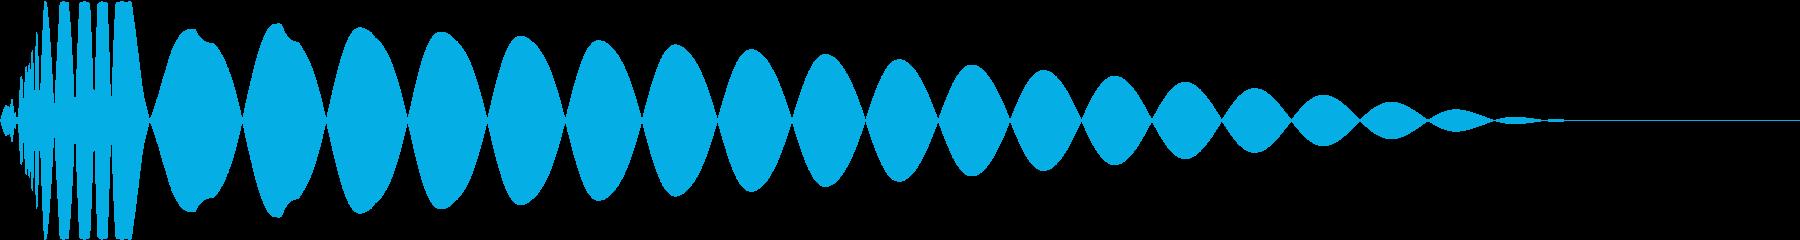 DTM Kick 43 オリジナル音源の再生済みの波形